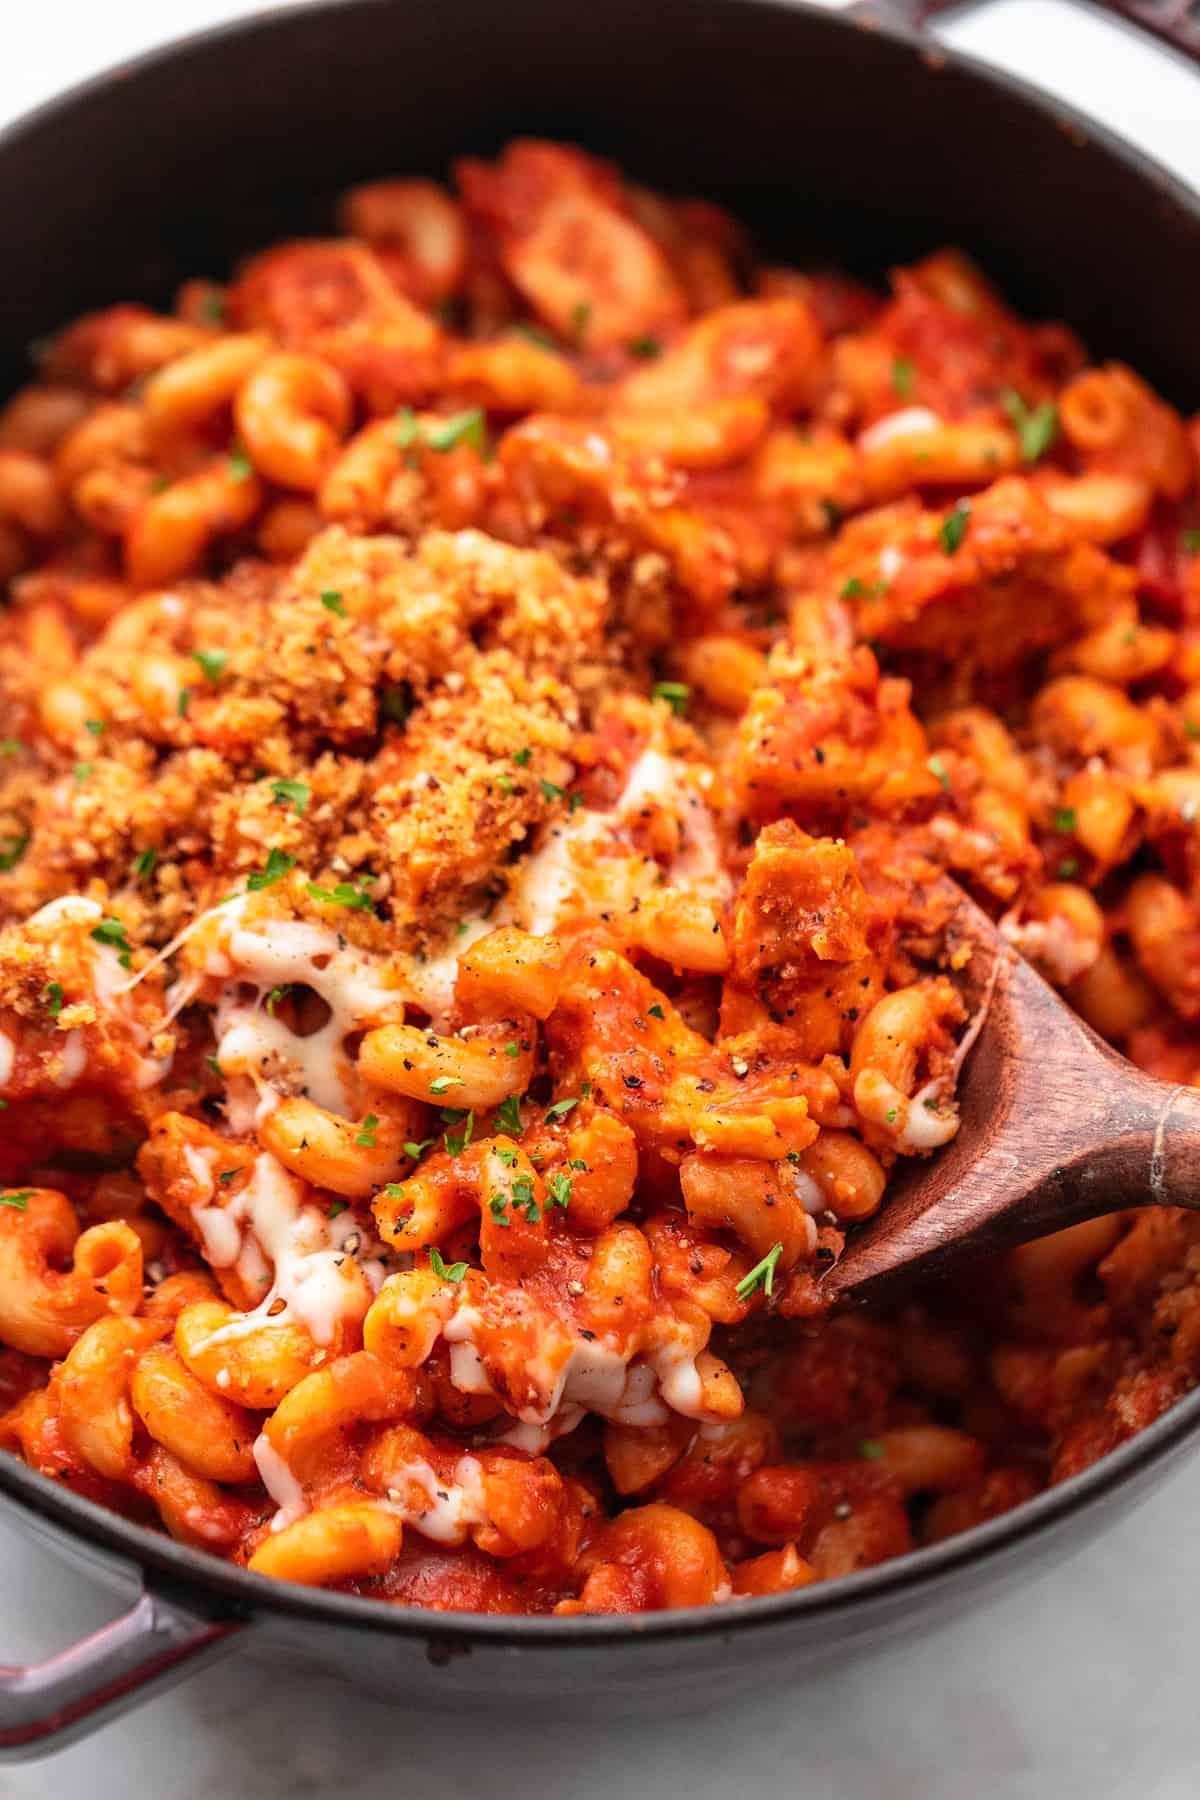 Eintopf Hühnchen Parmesan Pasta einfachste 30 Minuten Eintopf Pasta Rezept! | lecremedelacrumb.com